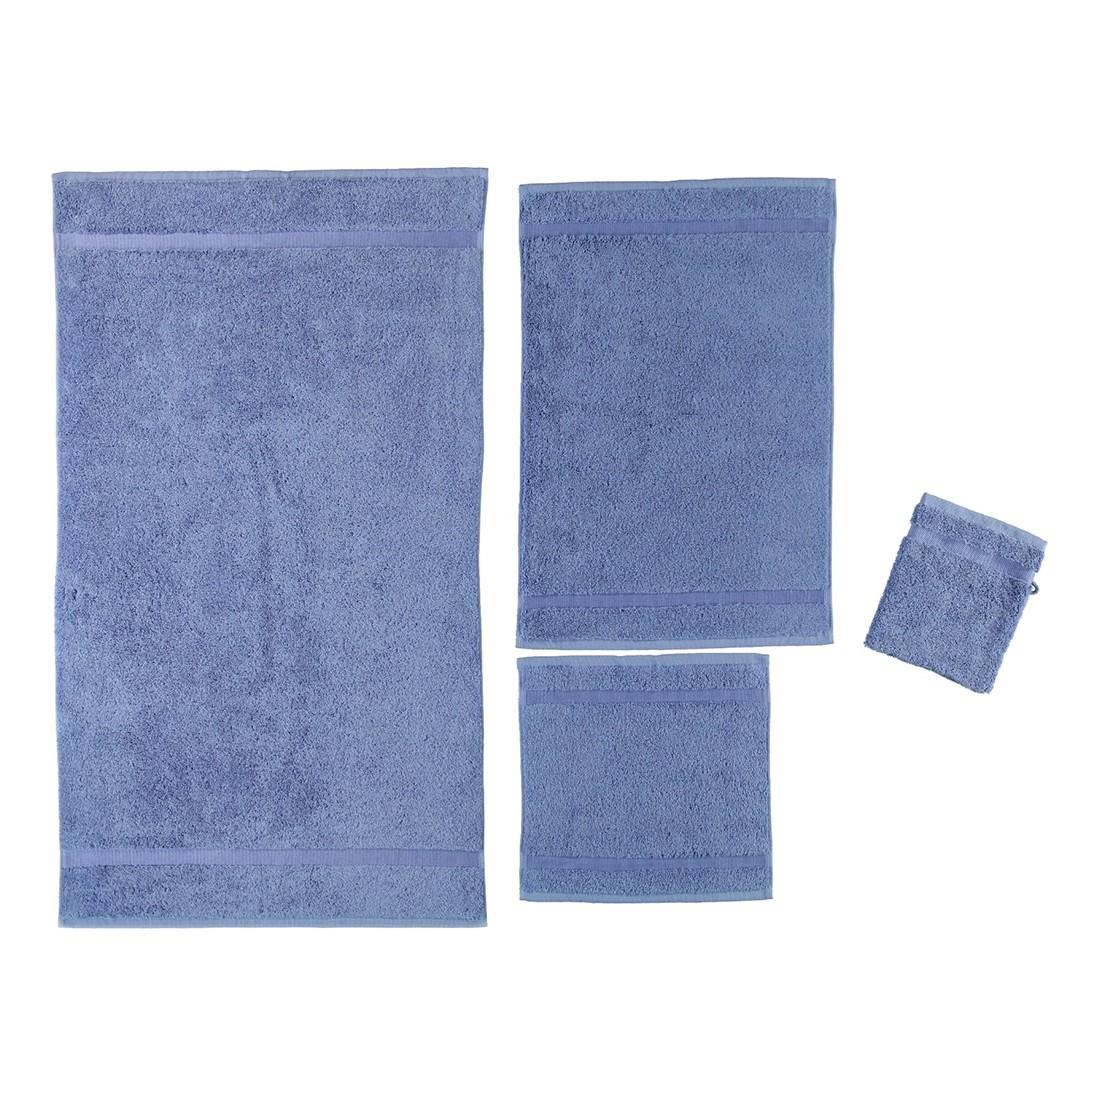 Handtuch Princess – 100% Baumwolle aqua – 78 – Duschtuch: 70 x 130 cm, Rhomtuft online kaufen